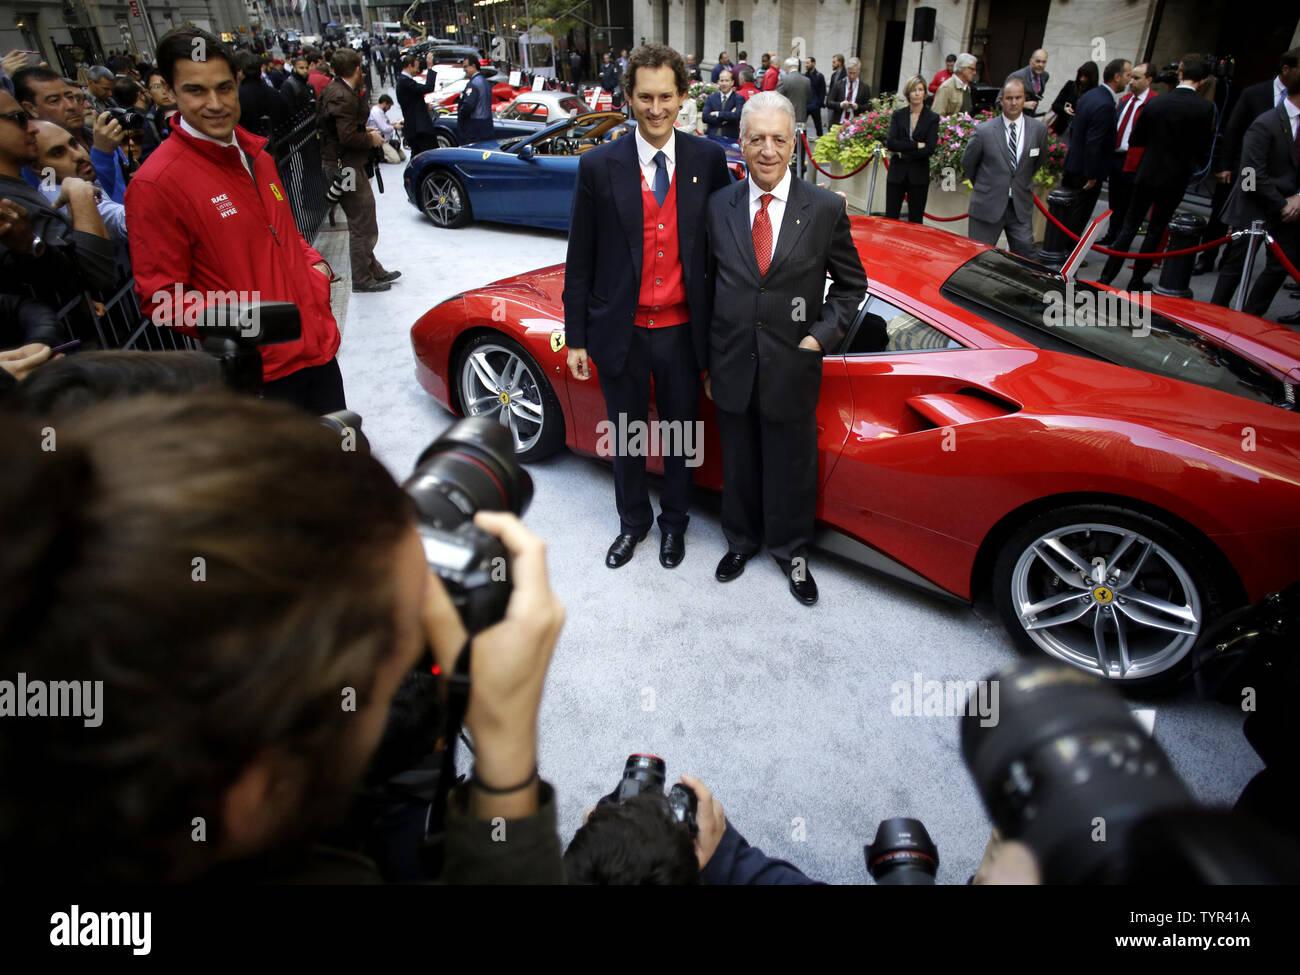 Fiat Chrysler Chairman John Elkann And Piero Ferrari Son Of Founder Enzo Ferrari Stand With A